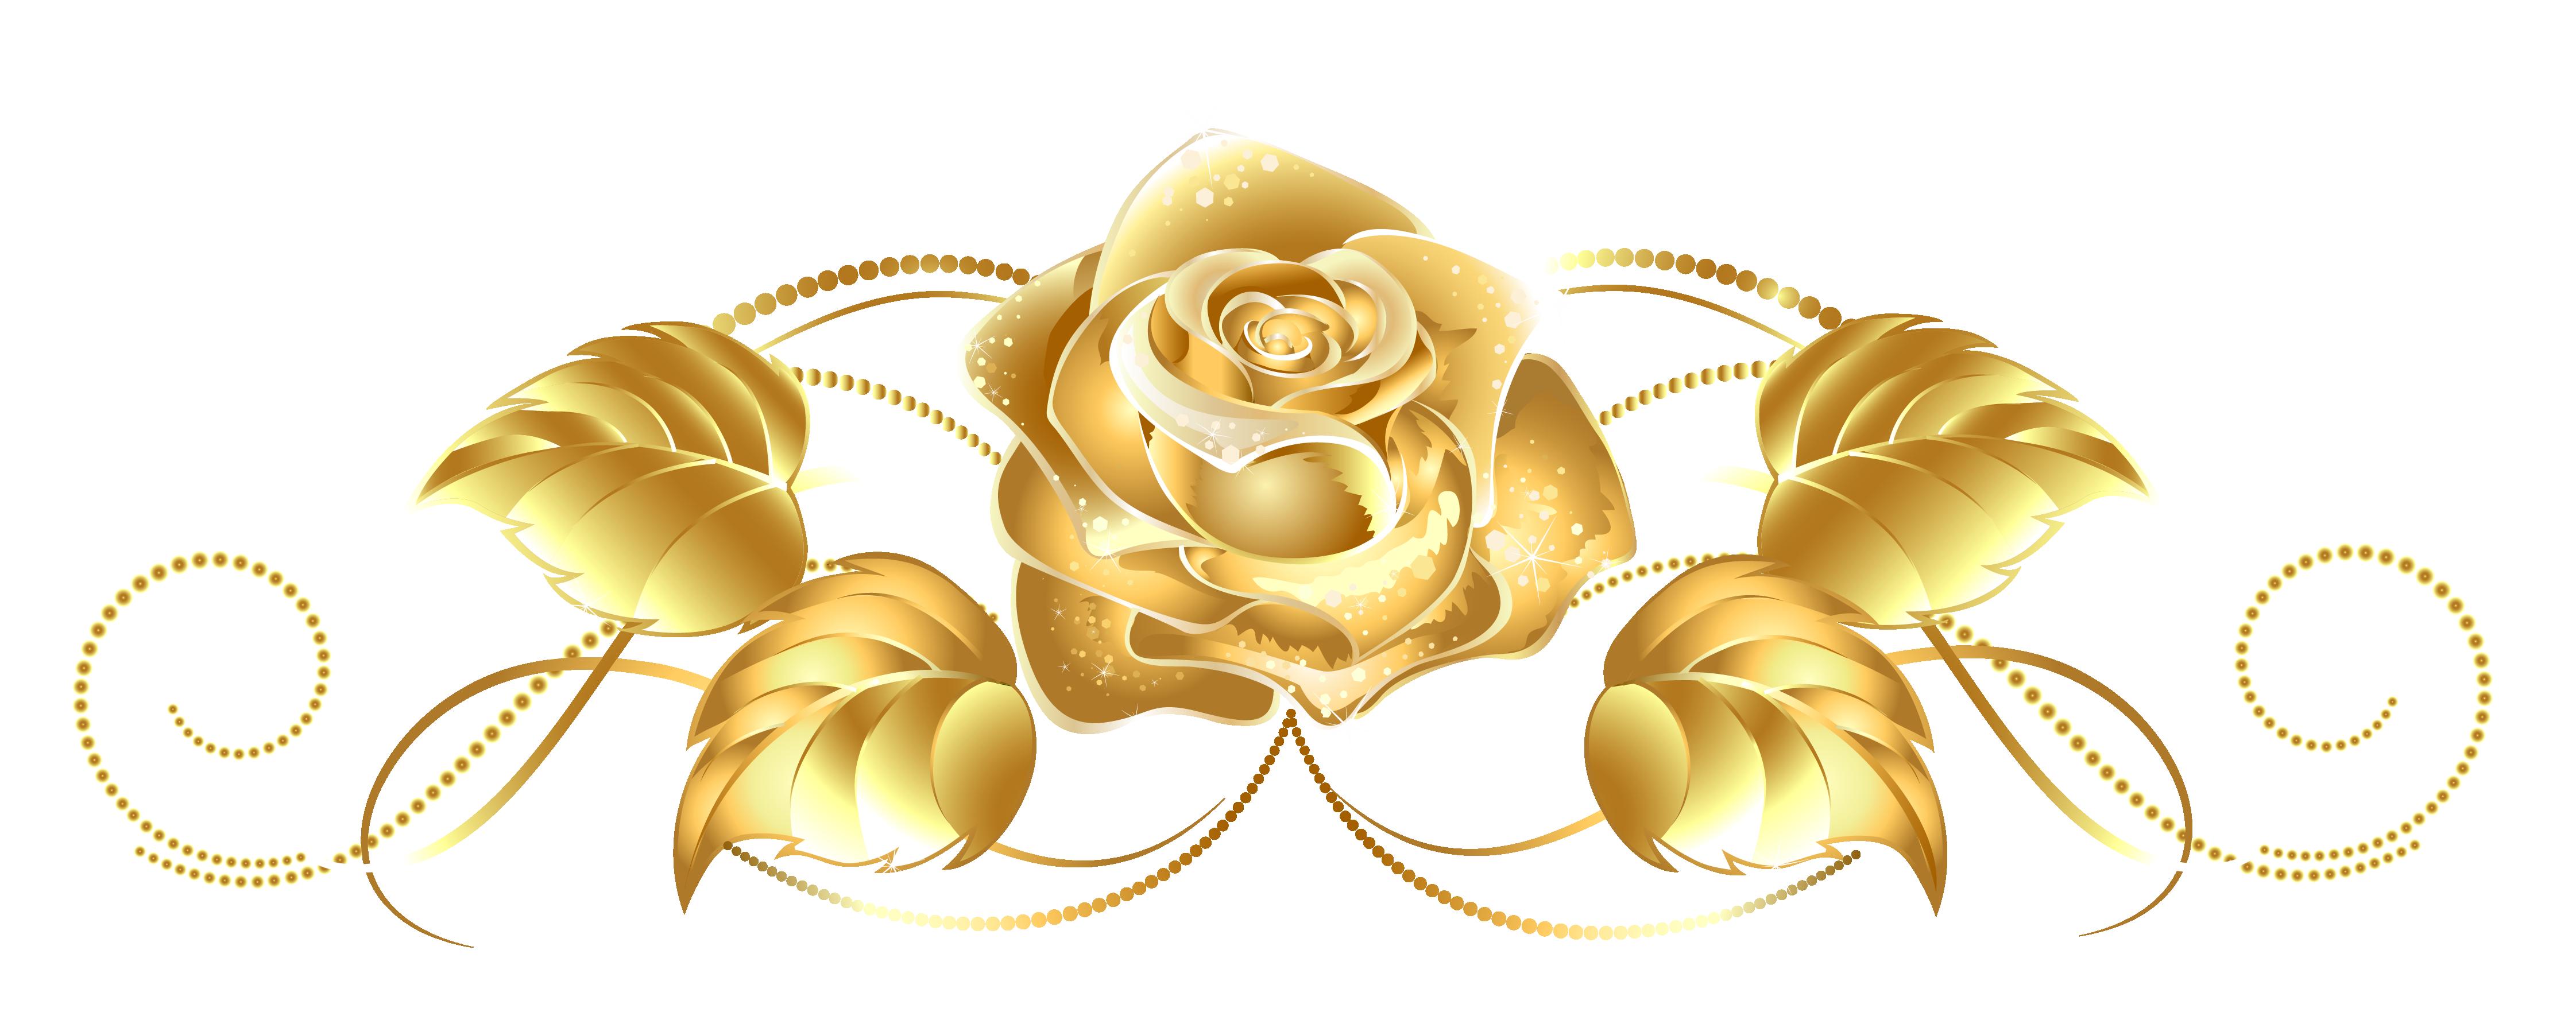 Beautiful Gold Rose Decor Png Clipart Fondo De Pantalla De Flores Vintage Decoracion De Rosas Marcos Con Flores